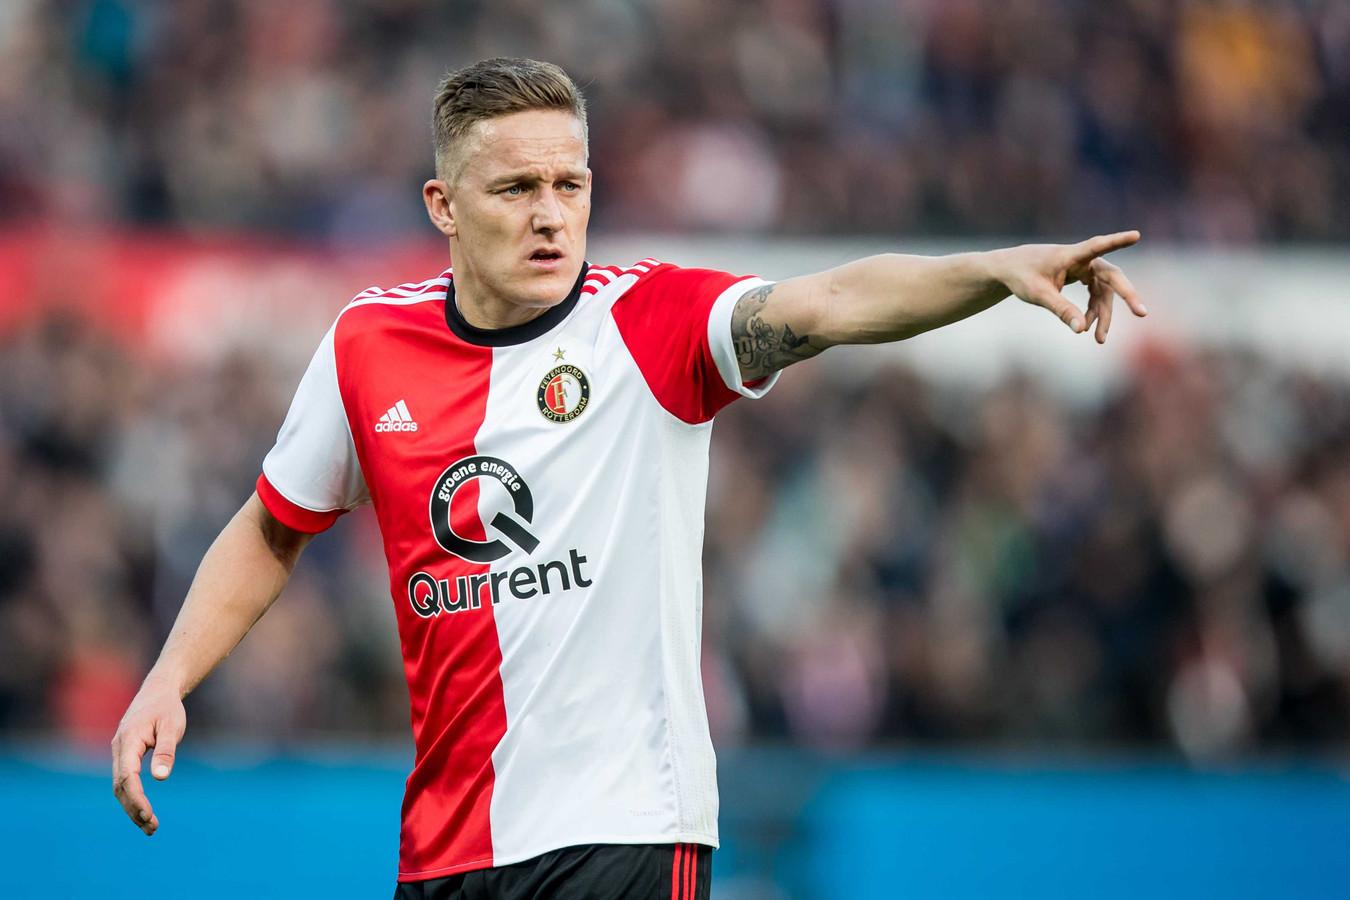 Feyenoord-speler Jens Toornstra komt uit de amateurs van Alphense Boys.